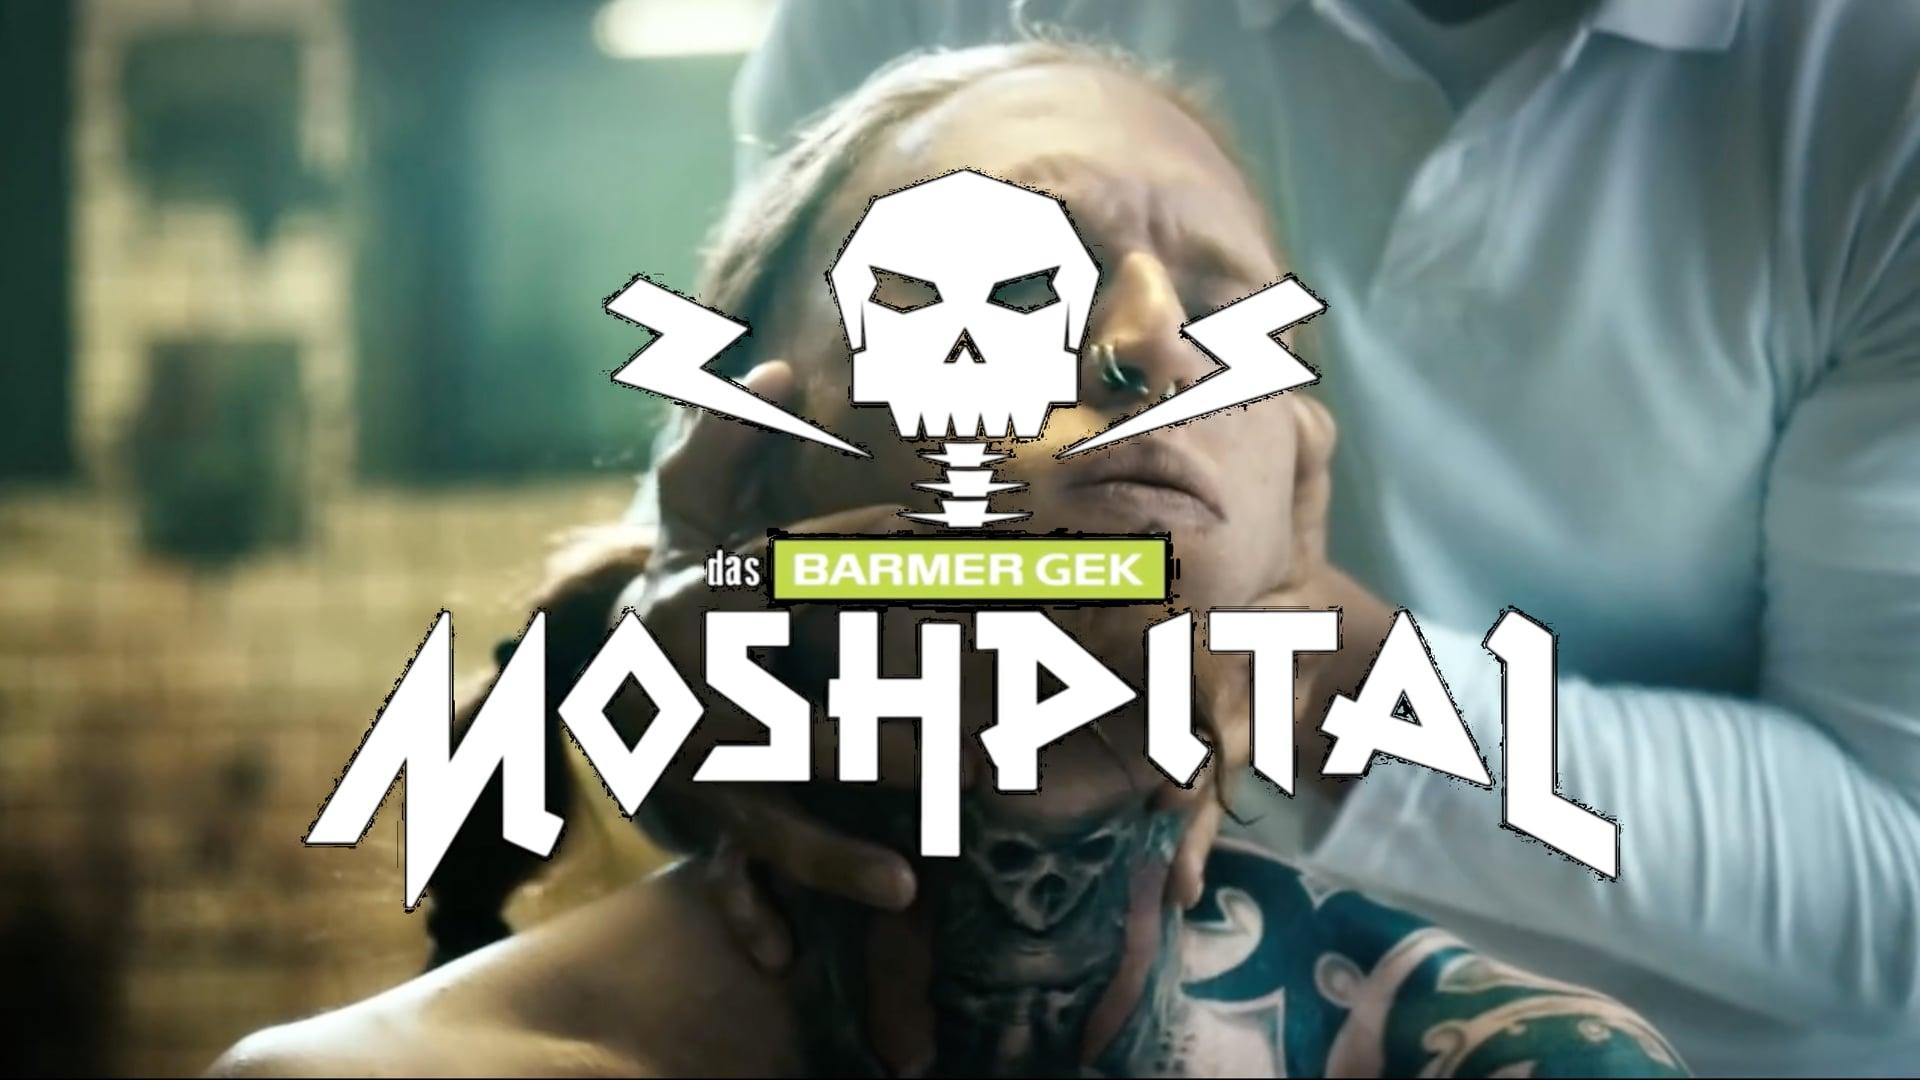 Moshpital